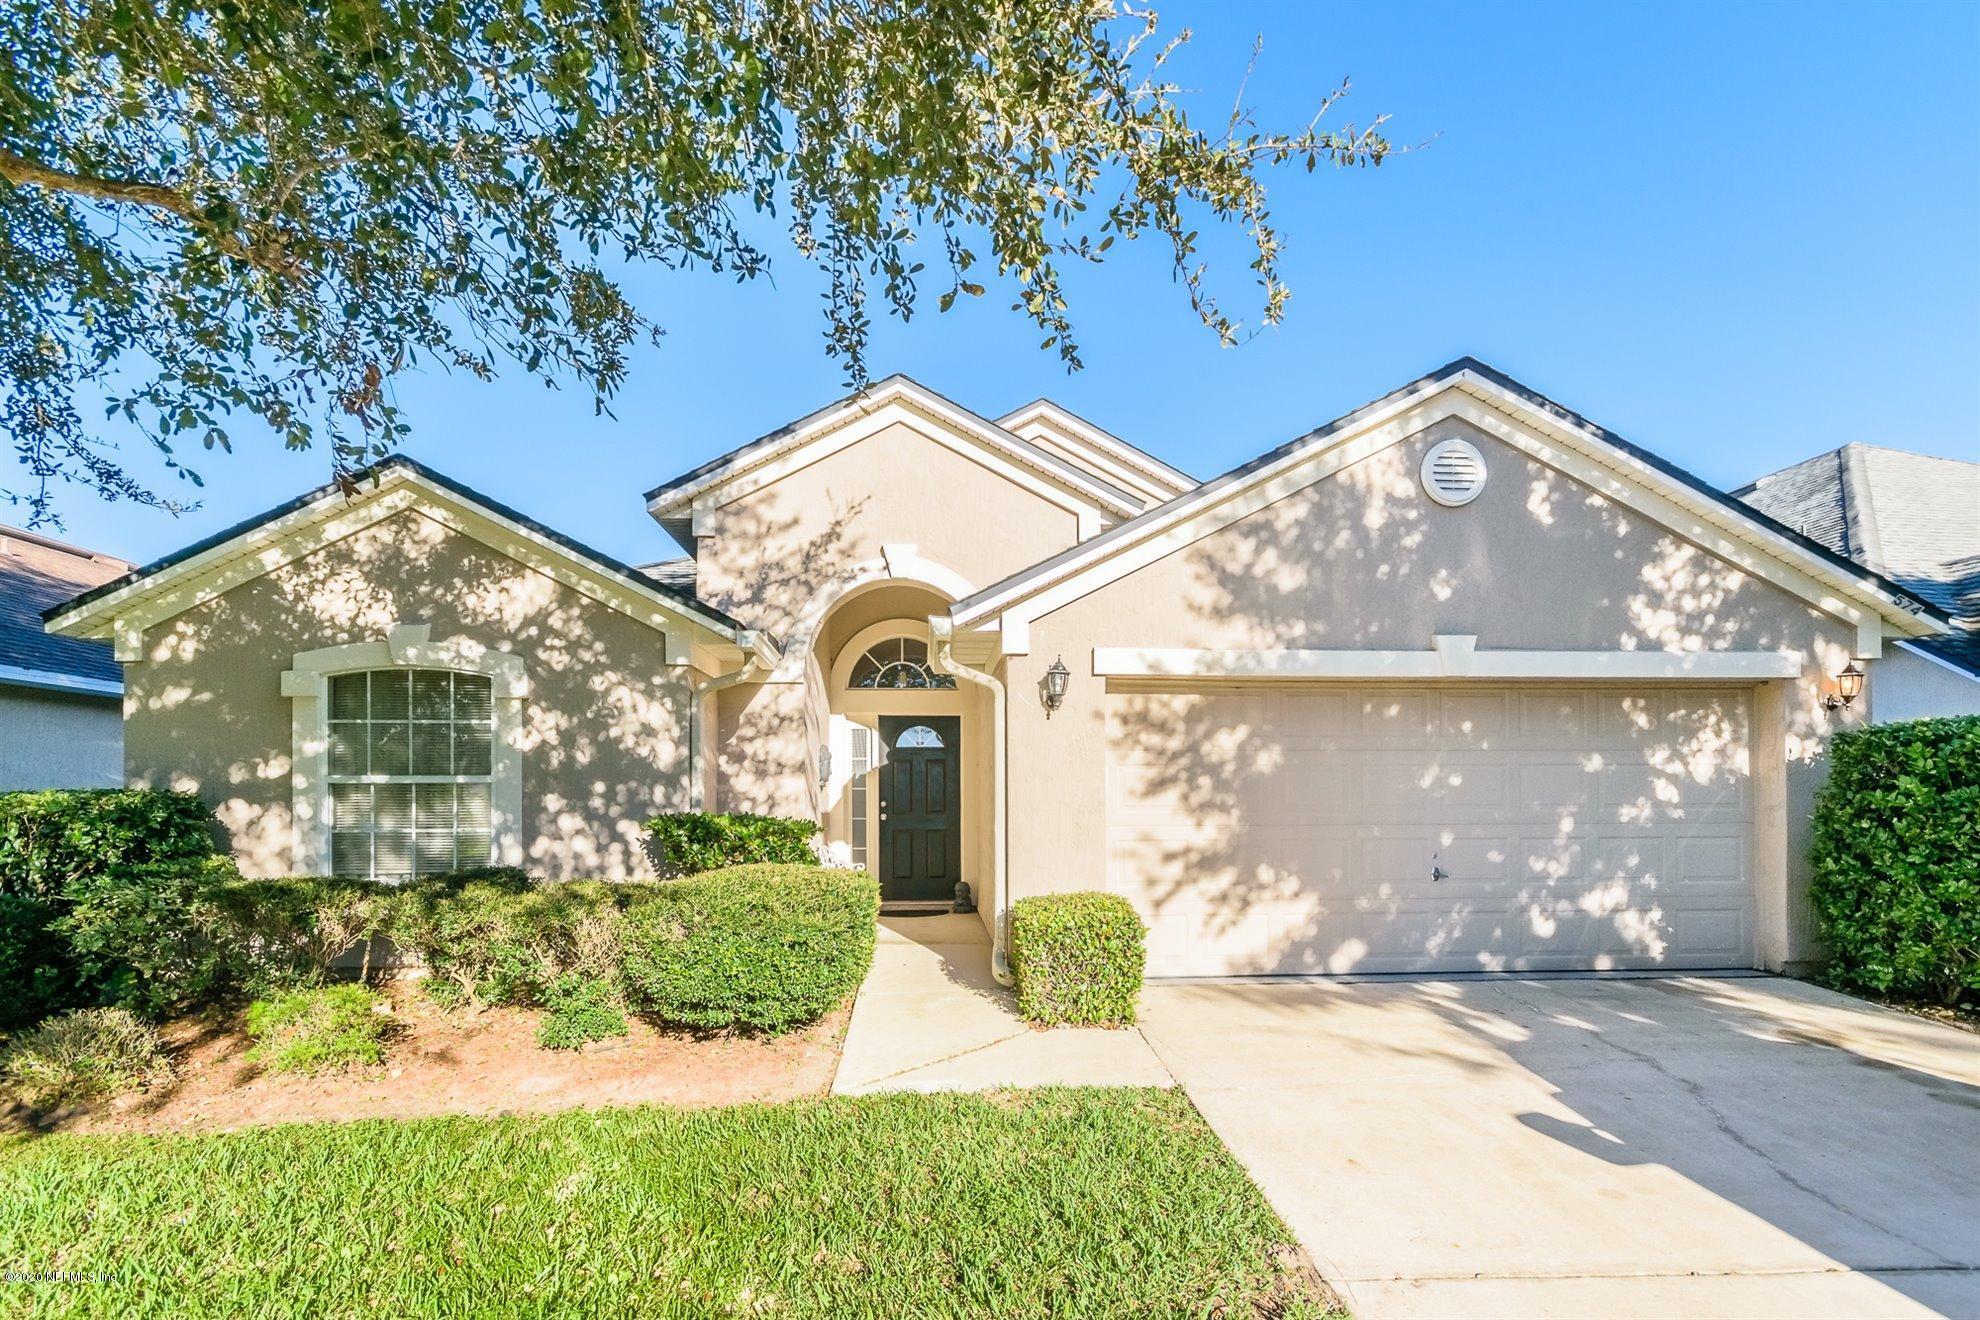 574 LONGMILL, ORANGE PARK, FLORIDA 32065, 3 Bedrooms Bedrooms, ,2 BathroomsBathrooms,Residential,For sale,LONGMILL,1080856